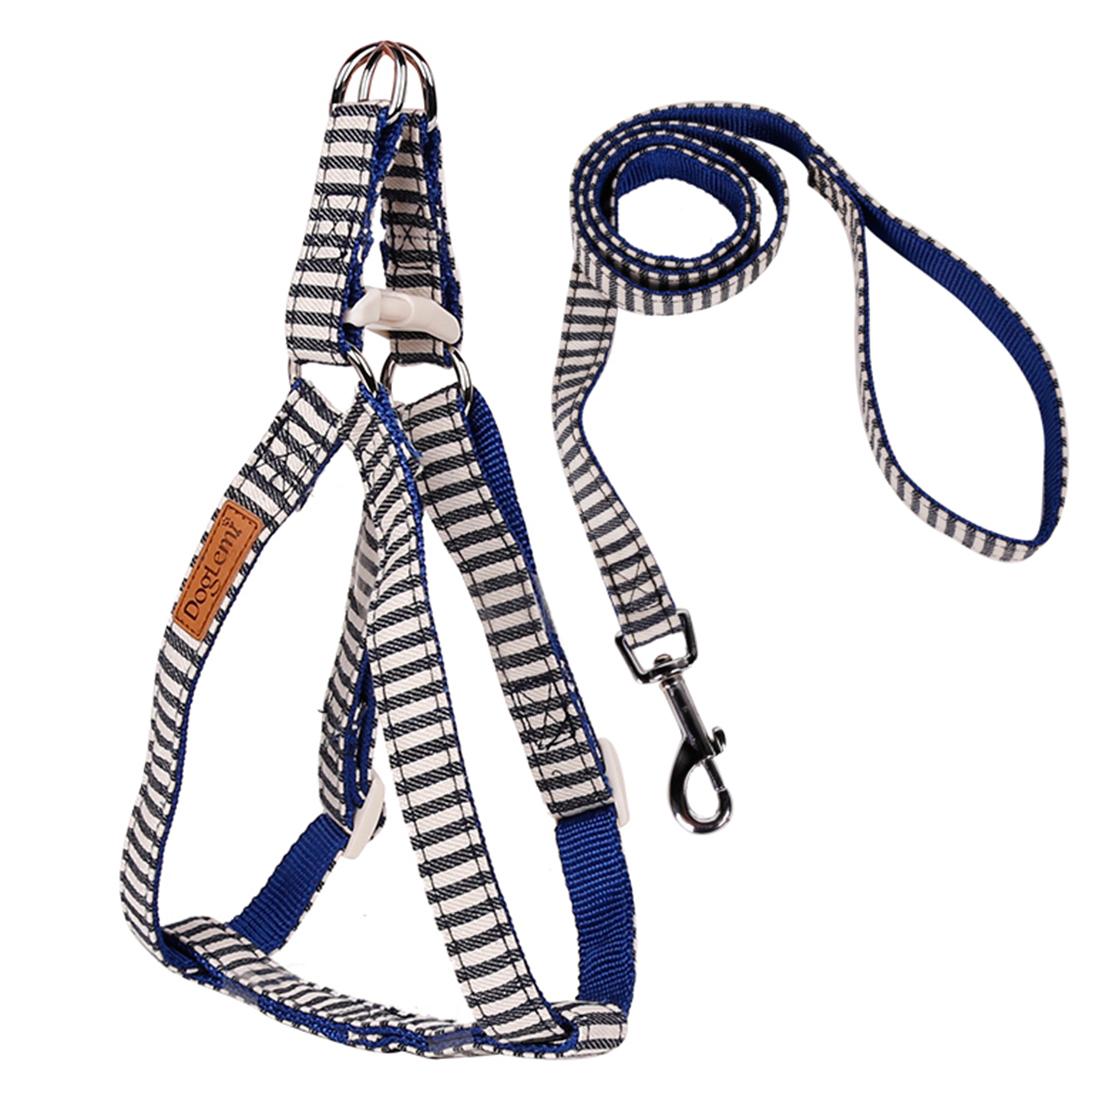 Adjustable Nylon Navy Stripe Dog Harness Leash Set Walking Leads Safe Control Collar Rope Blue M